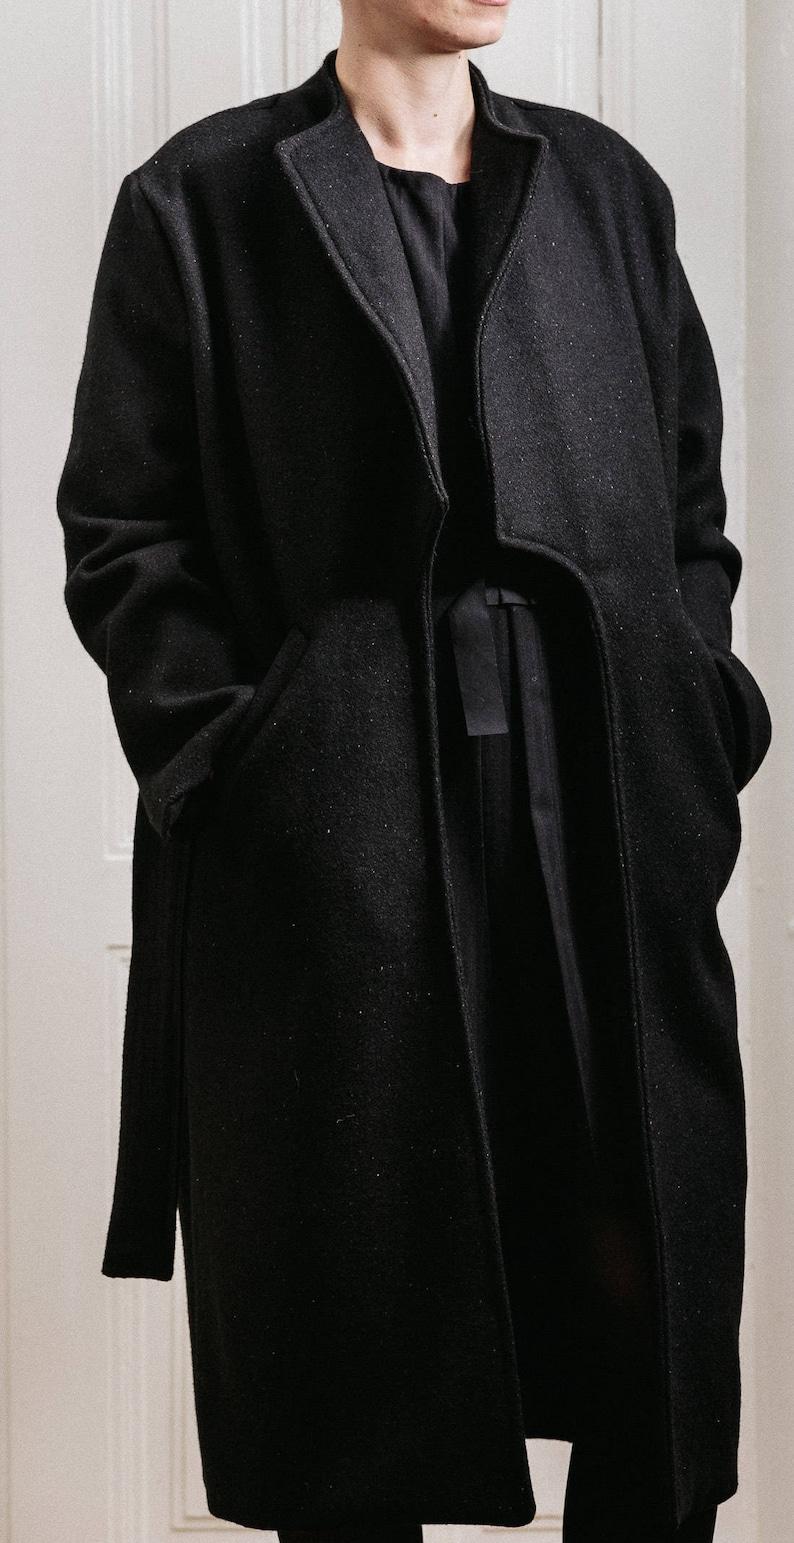 Woman/'s winter black coat  Warm long front pockets fashion coat  Belt black woman/'s wool coat  Elegant woman/'s long coat  Fasada 15076-3